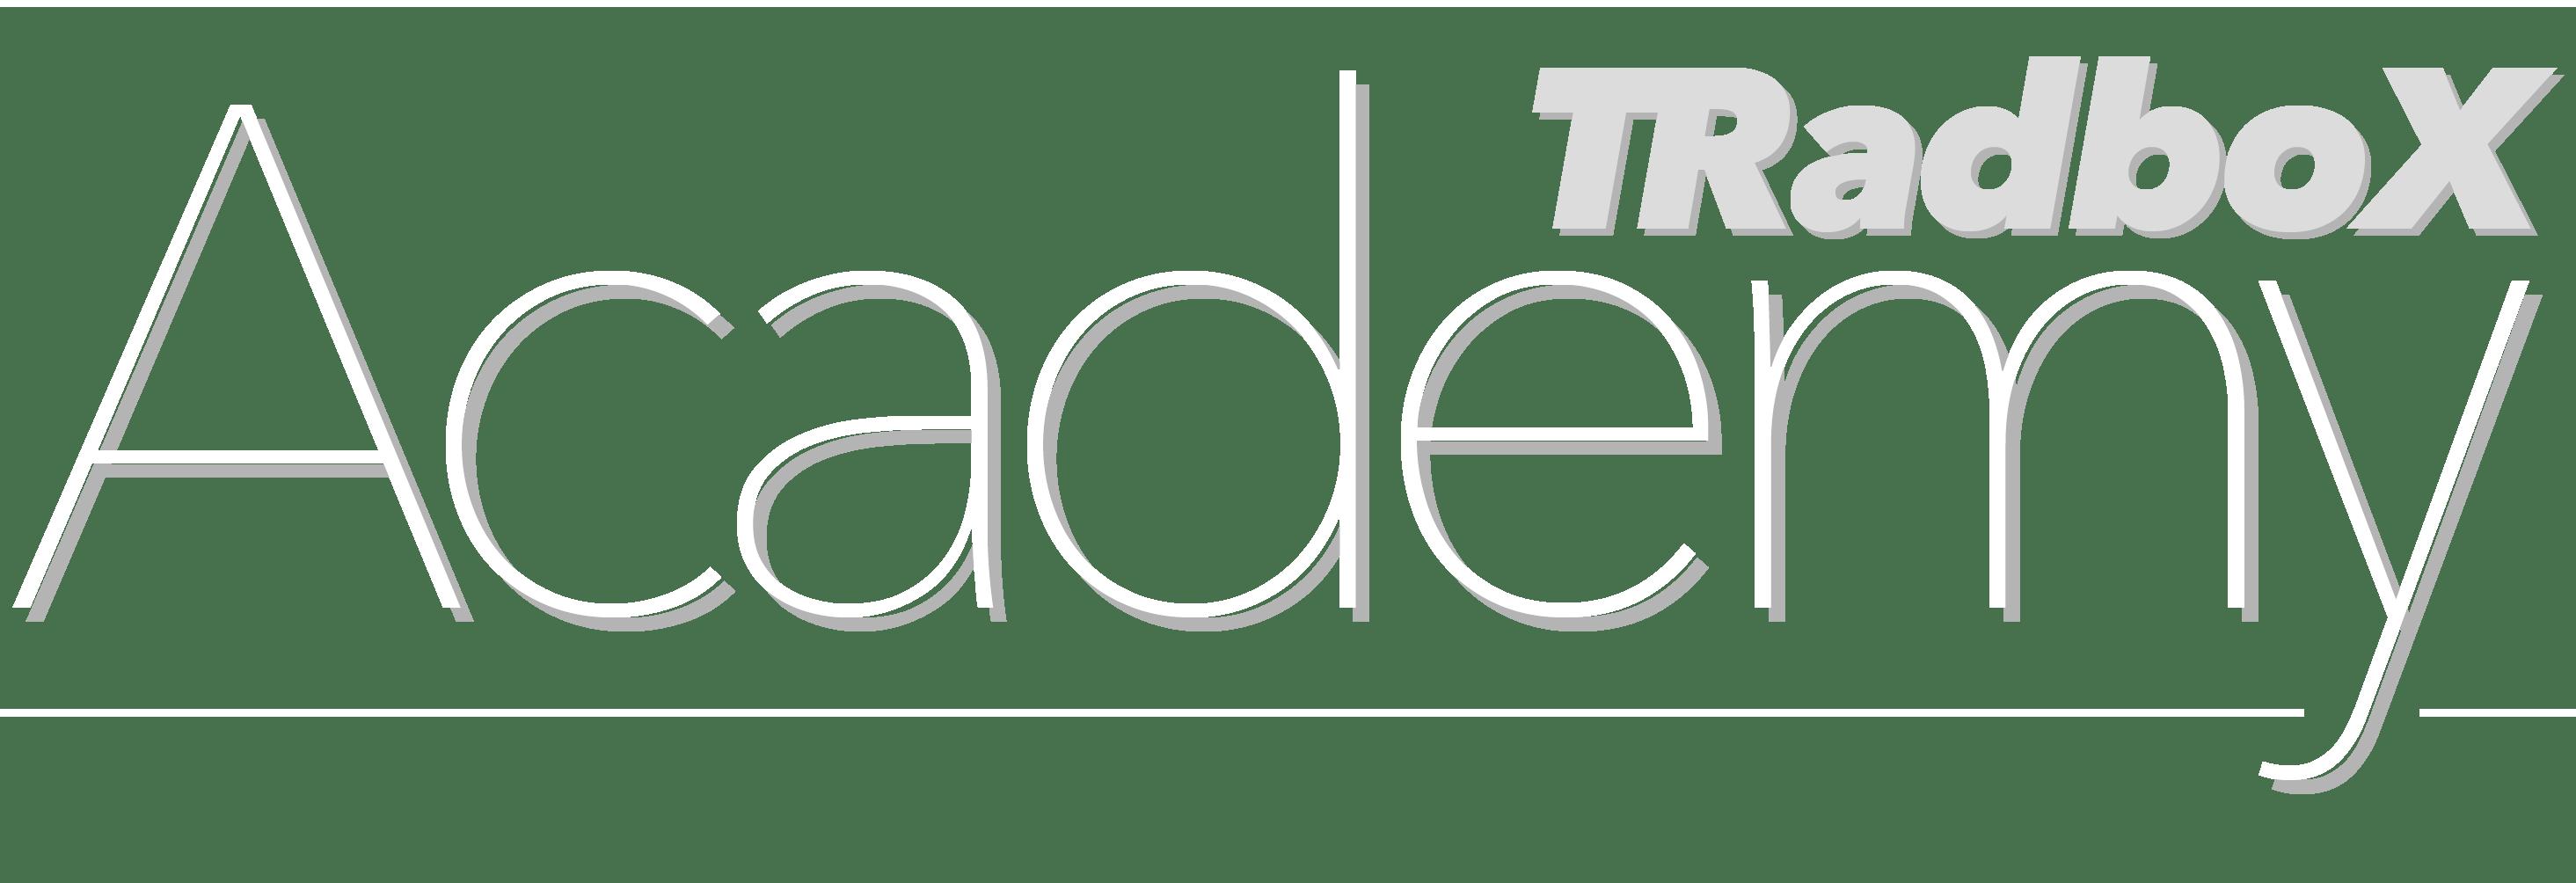 TRadboX Academy